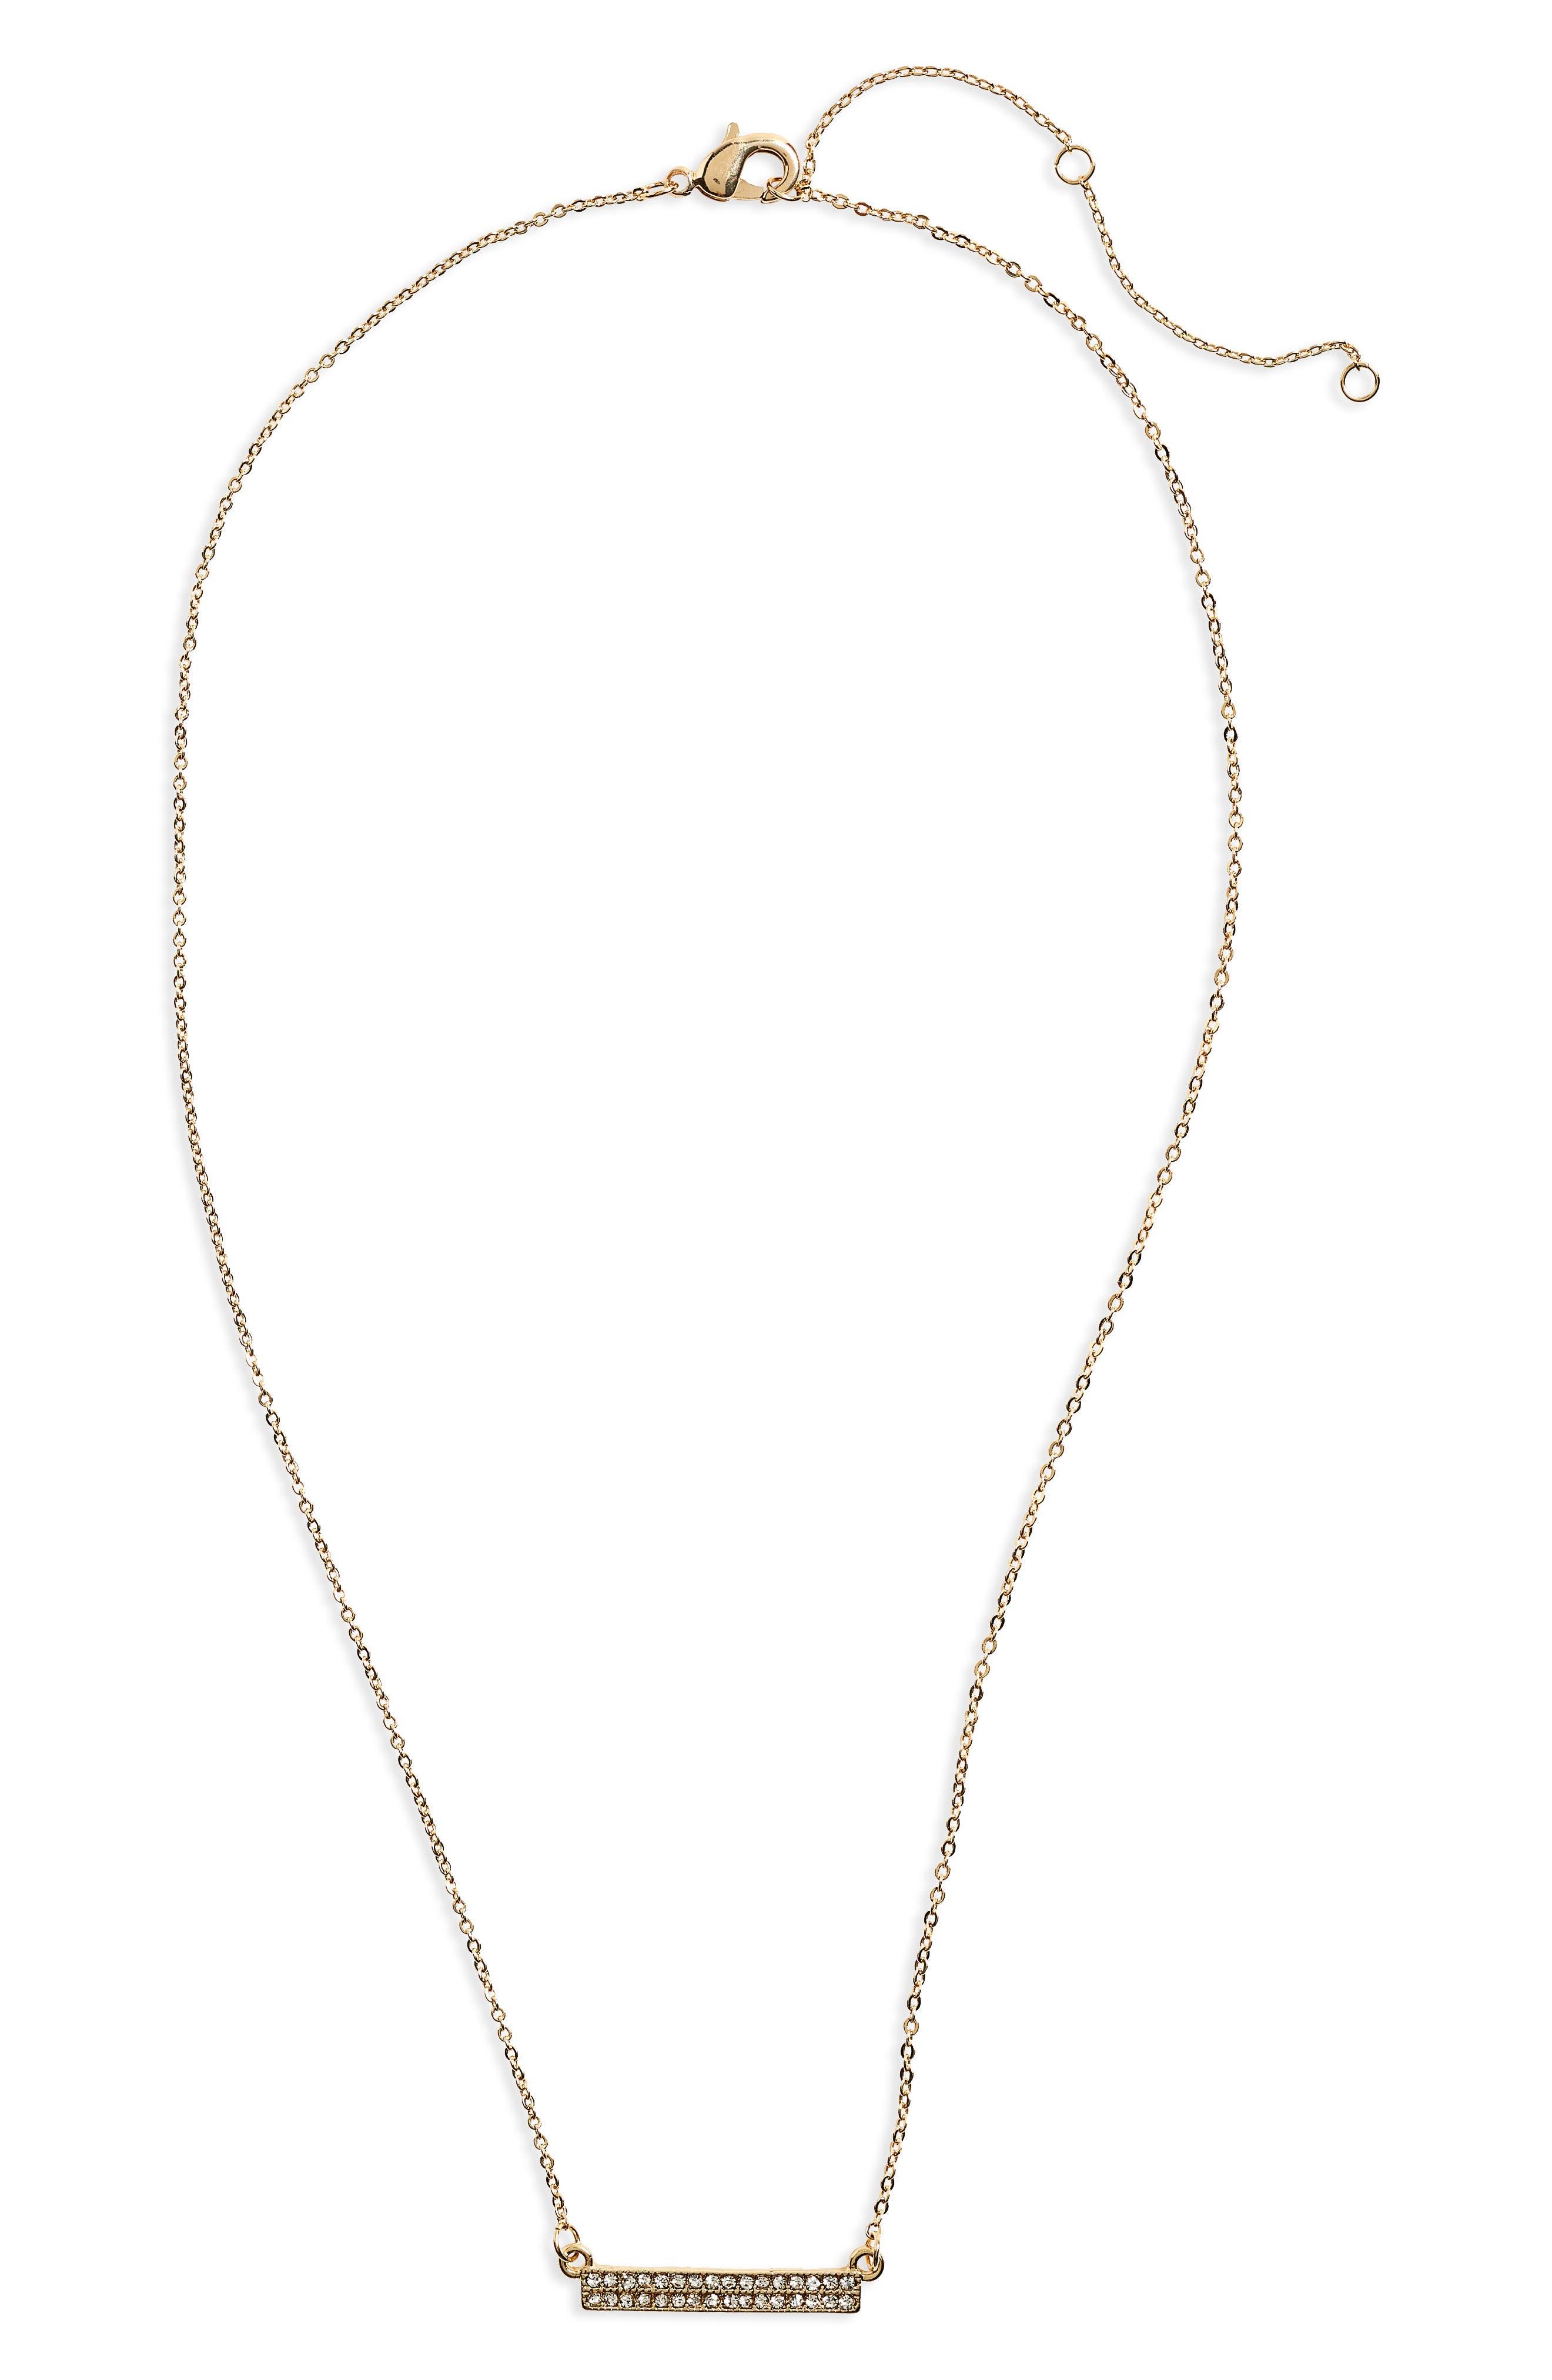 Crystal Bar Pendant Necklace,                             Main thumbnail 1, color,                             Gold/ Crystal